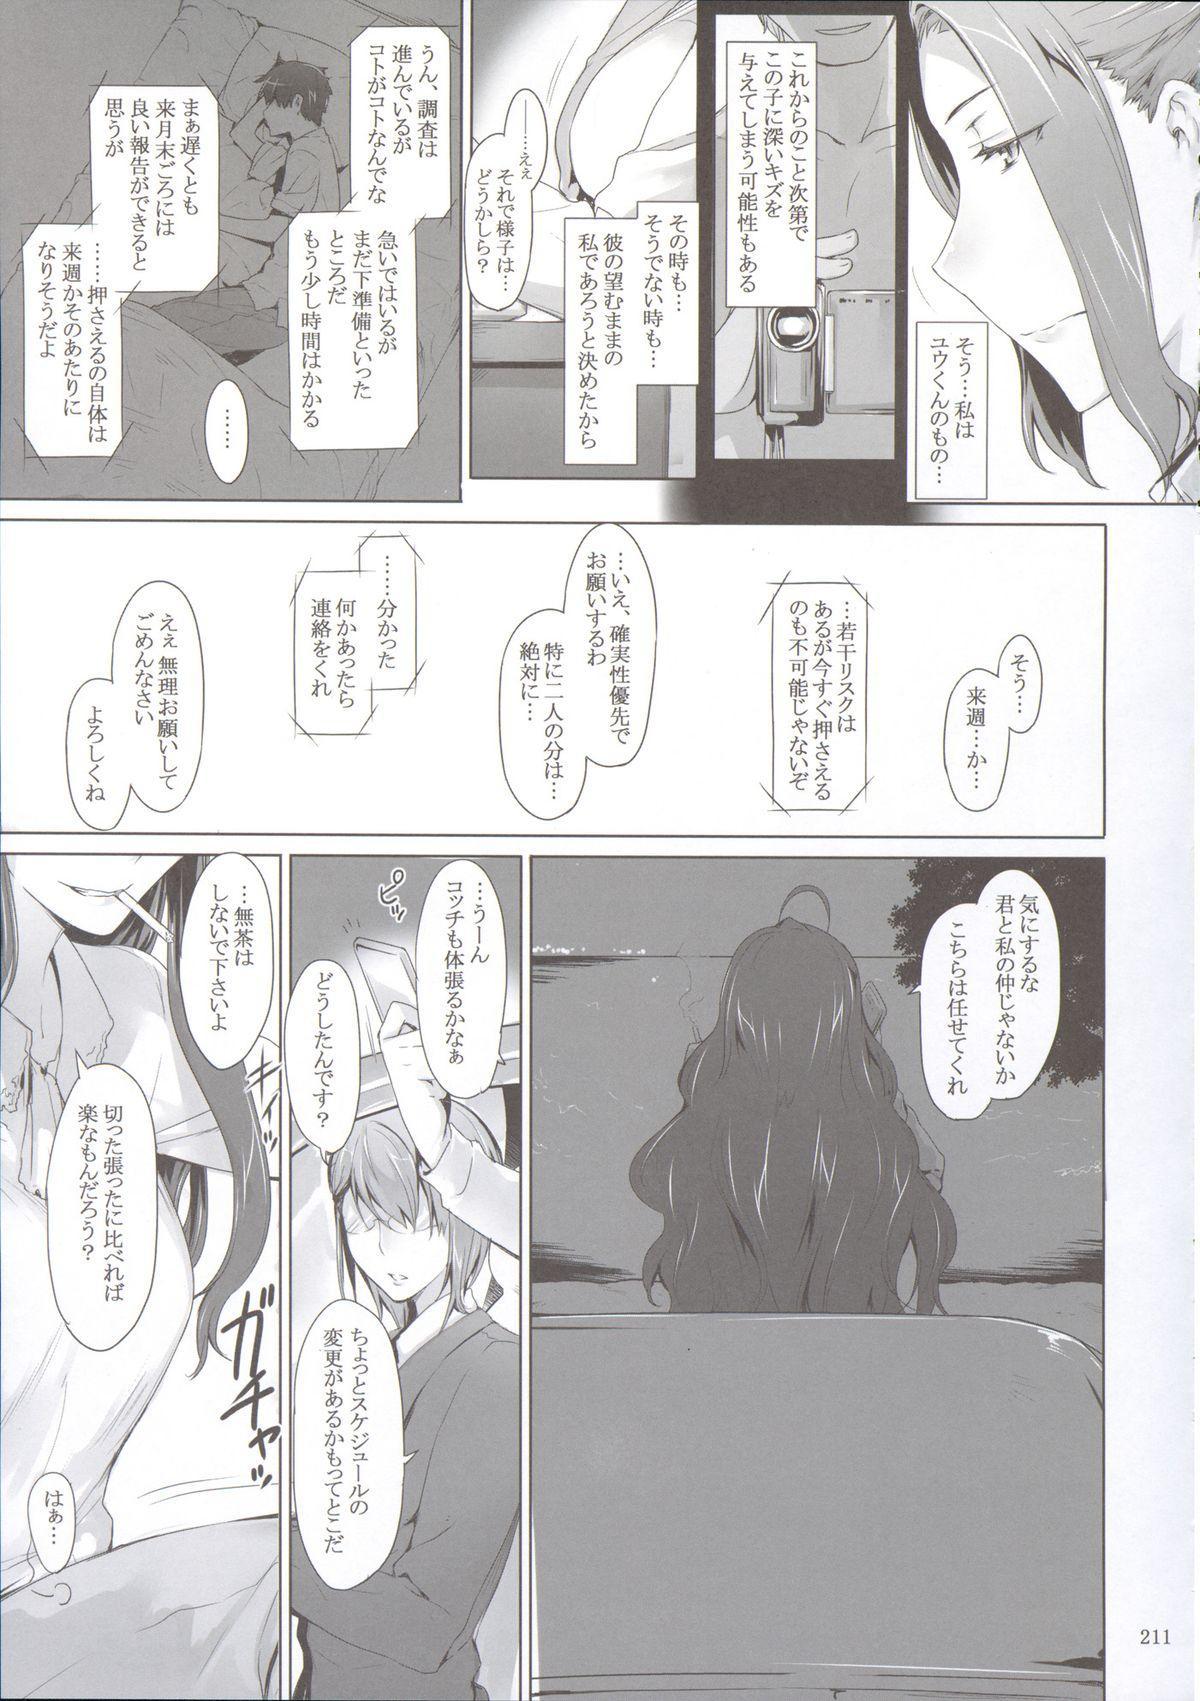 (C86) [MTSP (Jin)] Tachibana-san-chi no Dansei Jijou Matome Ban [Incomplete] 9